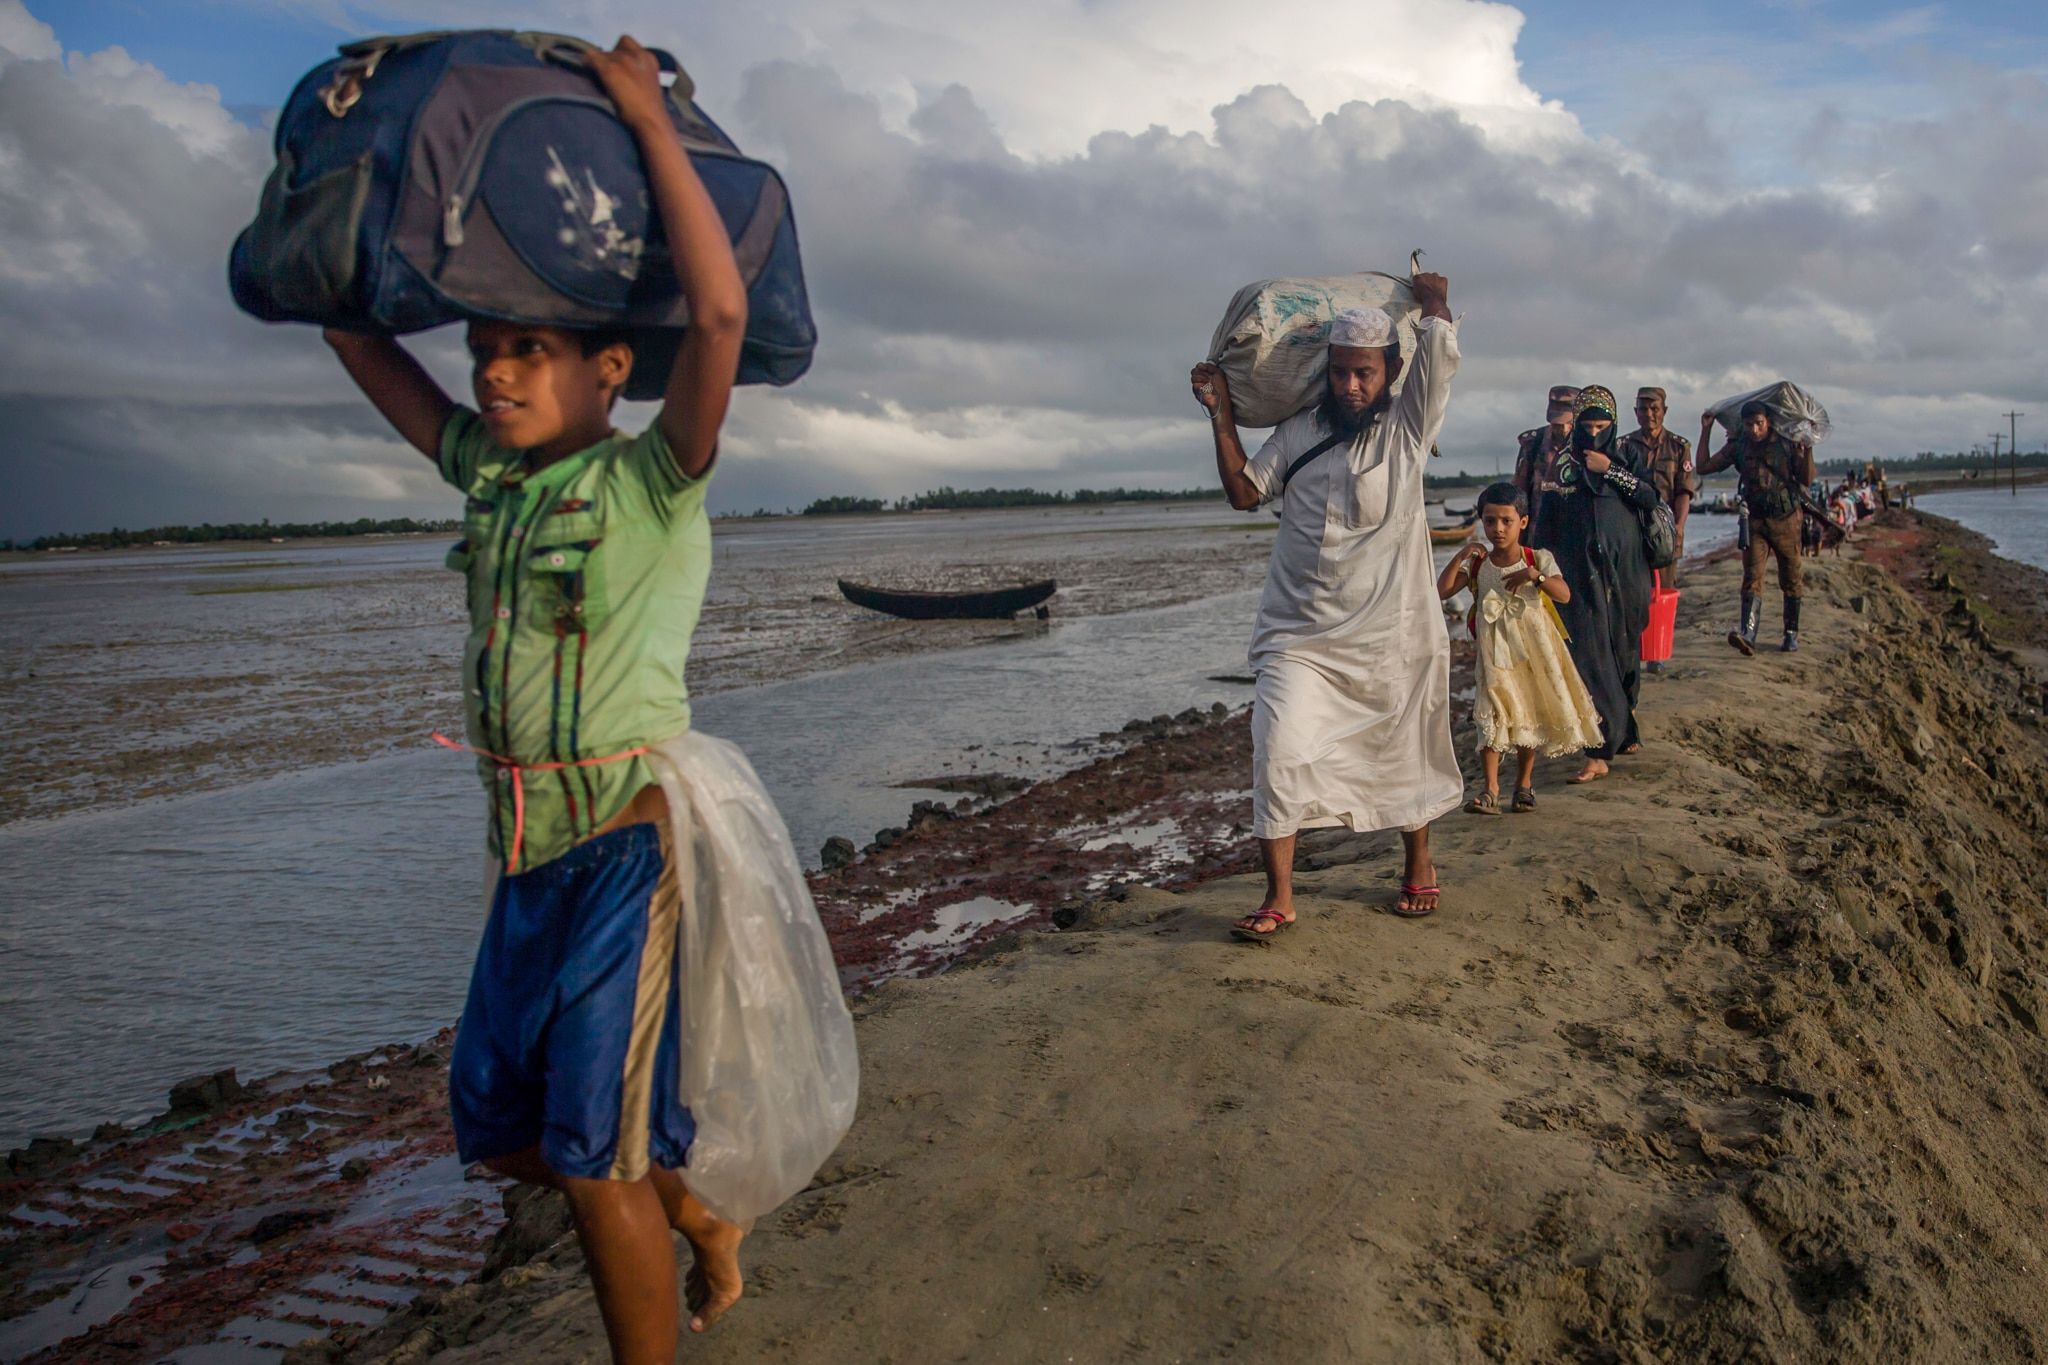 Refugees walking alongside water carrying large bundles of belongings (© AP Images)